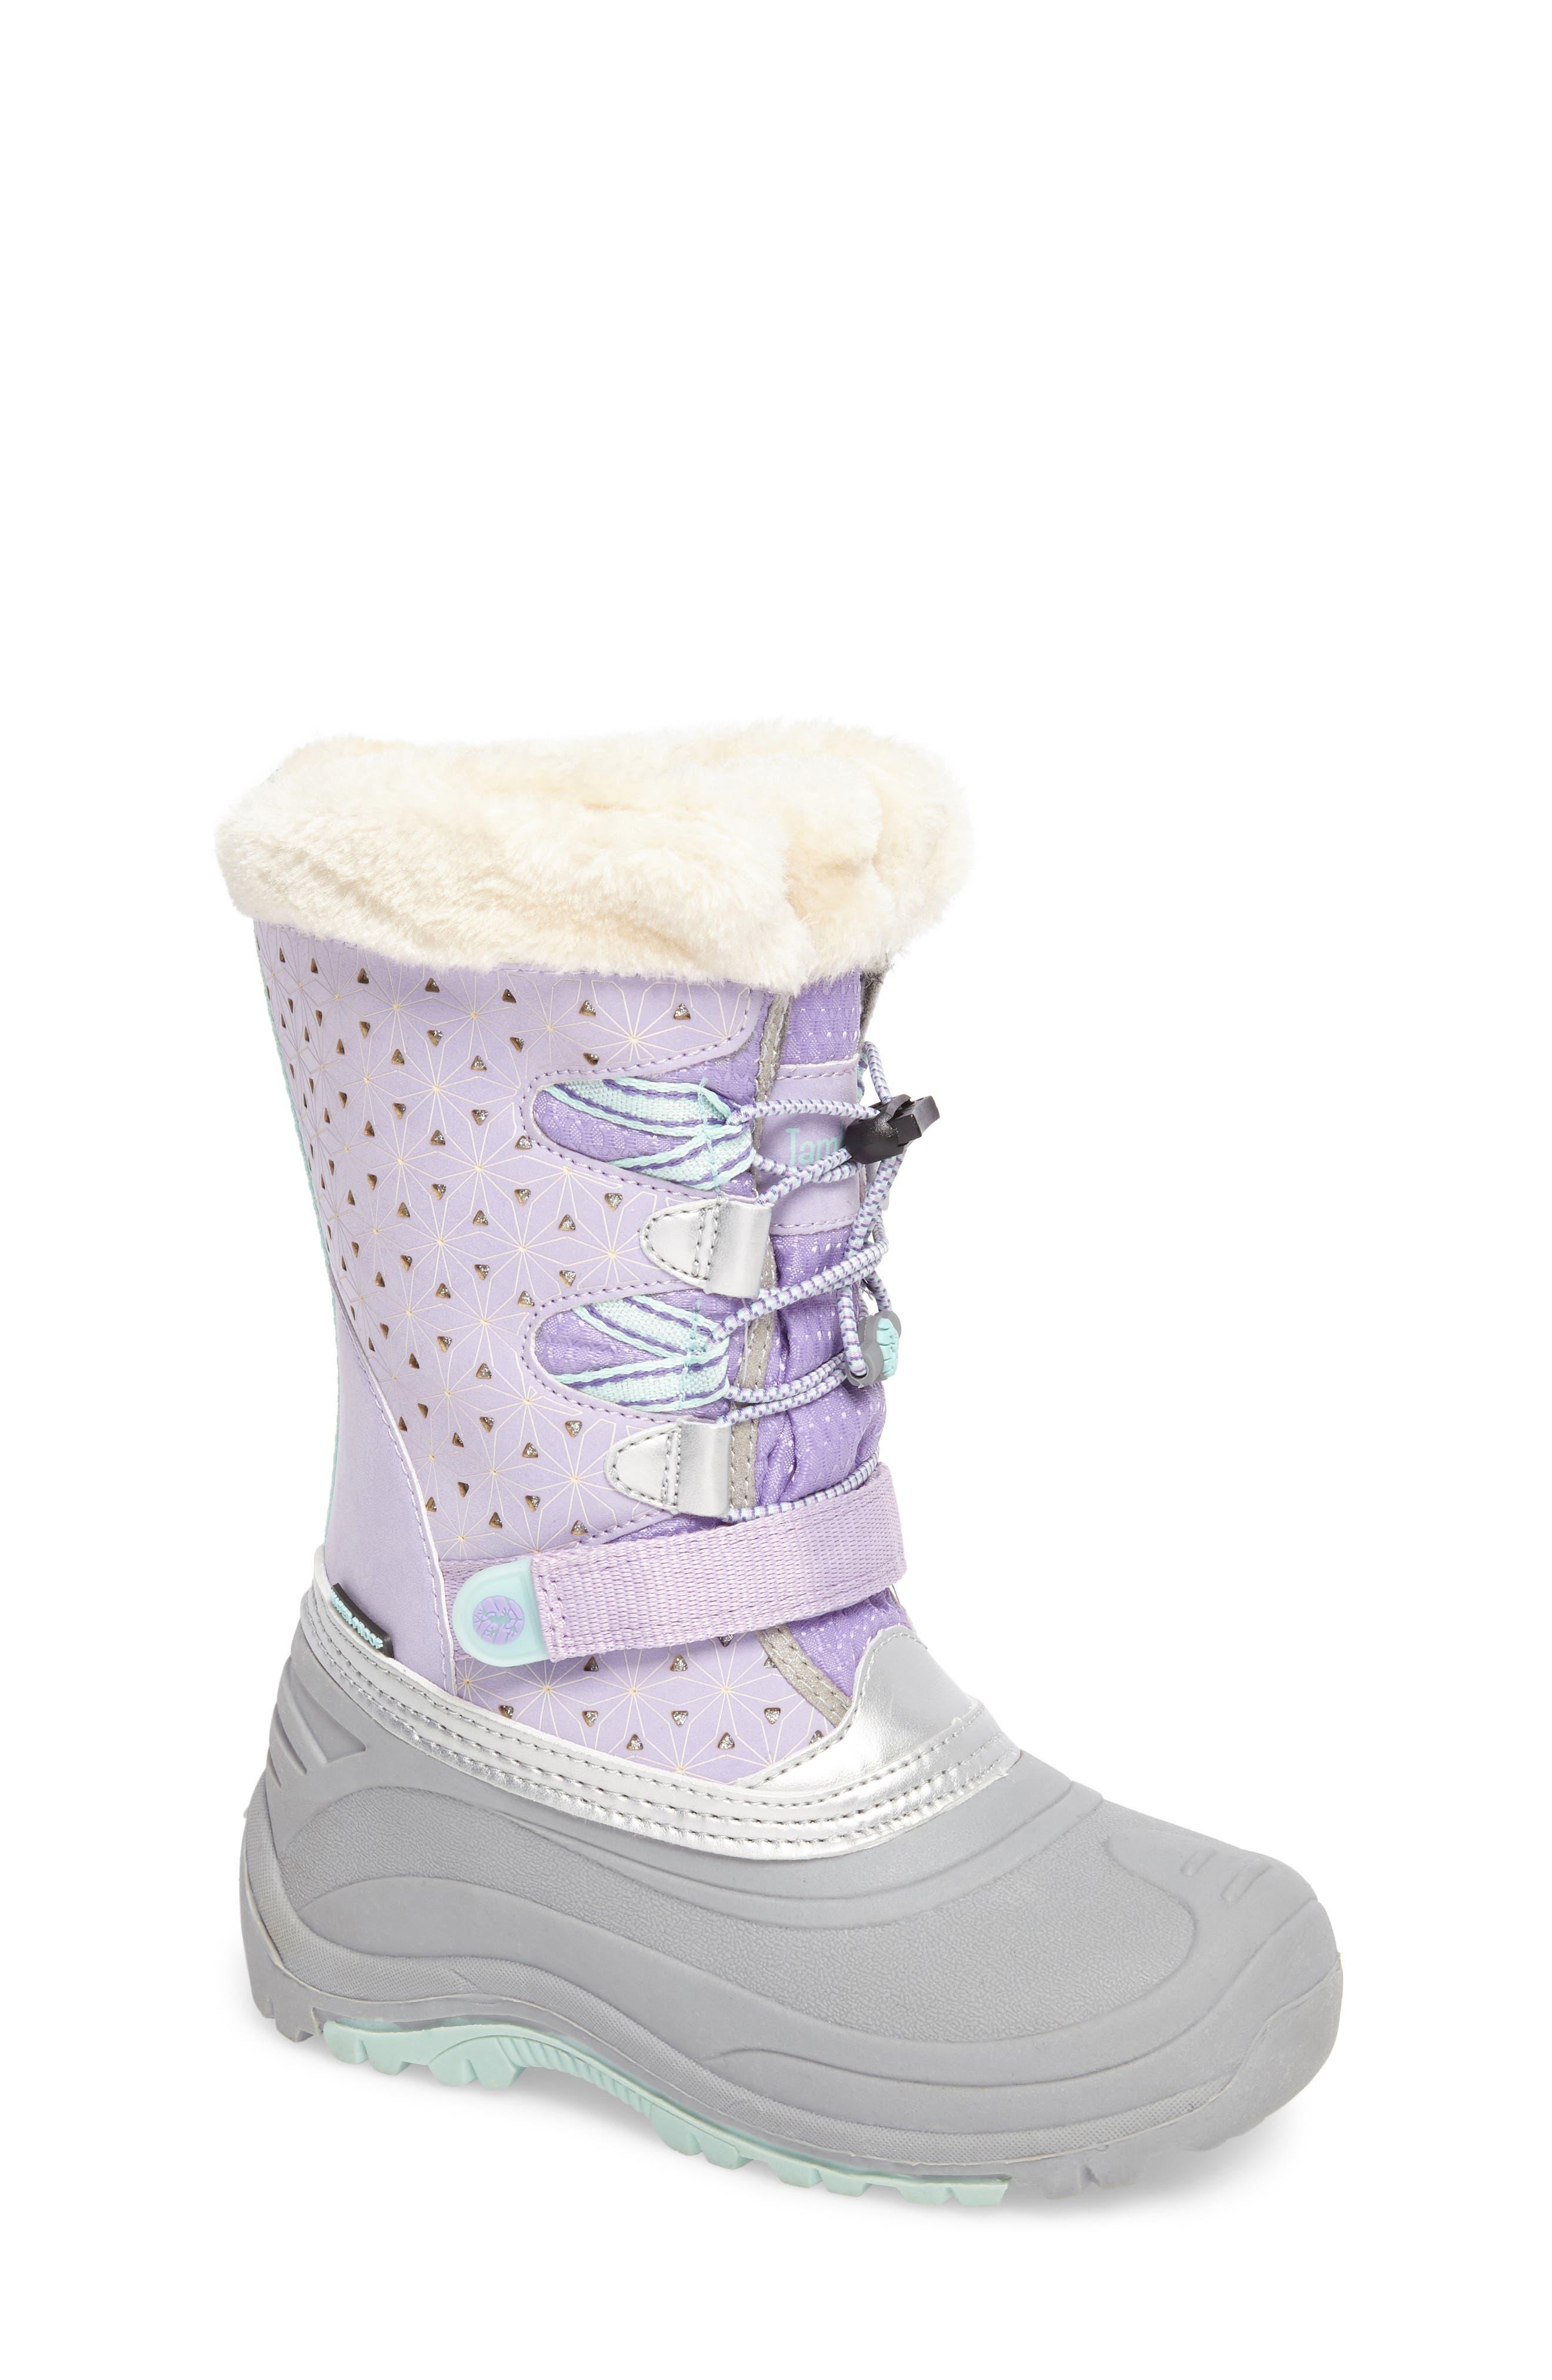 Alternate Image 1 Selected - Jambu 'Venom' Waterproof Insulated Snow Boot (Toddler, Little Kid & Big Kid)